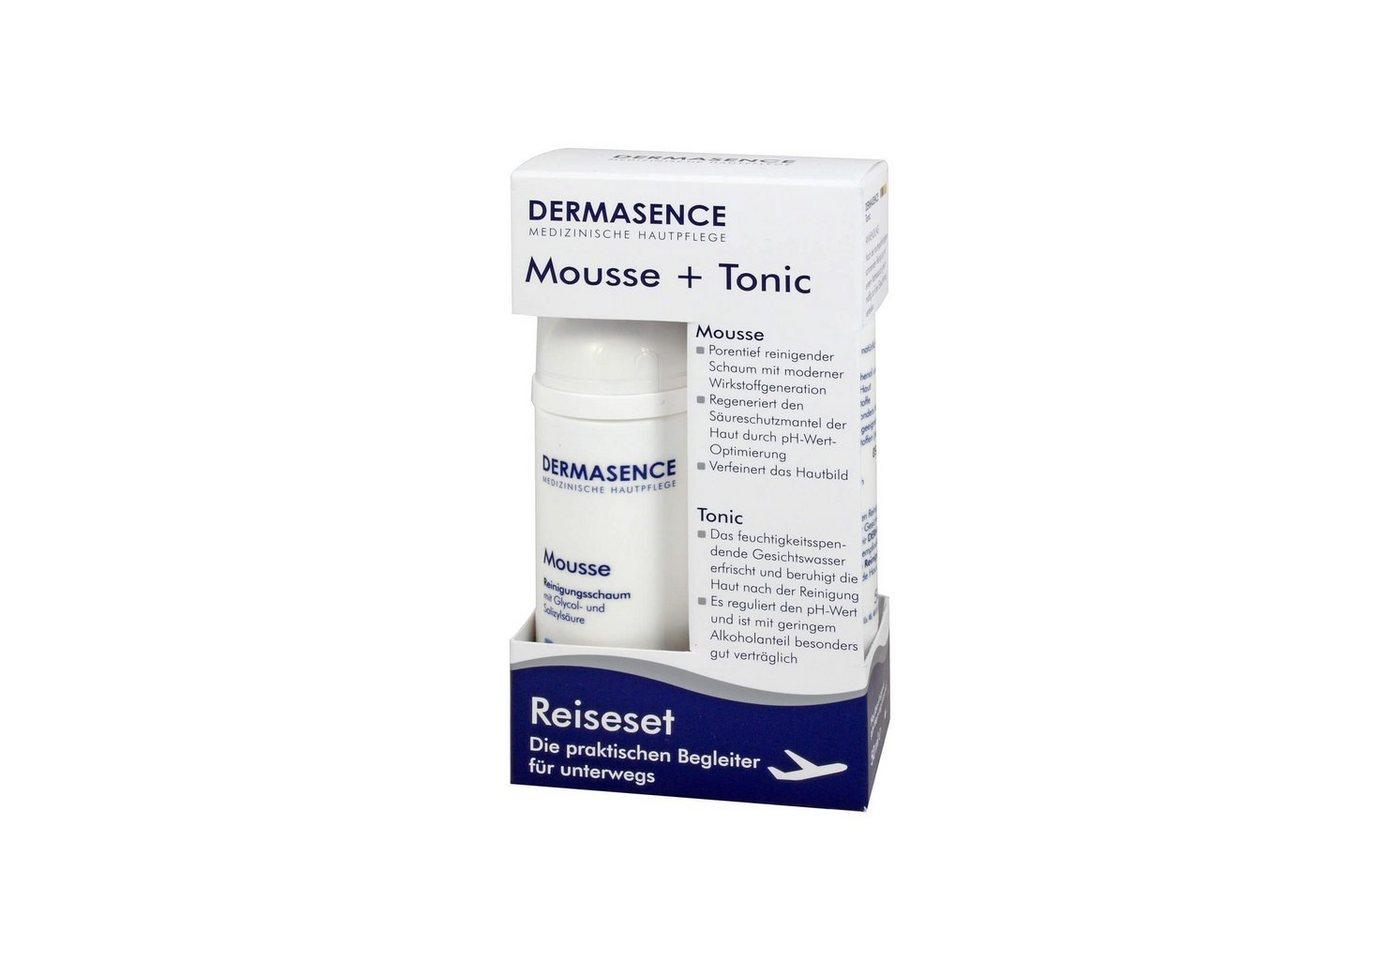 Dermasence DERMASENCE Reinigungs-Duo , 2X50 ml